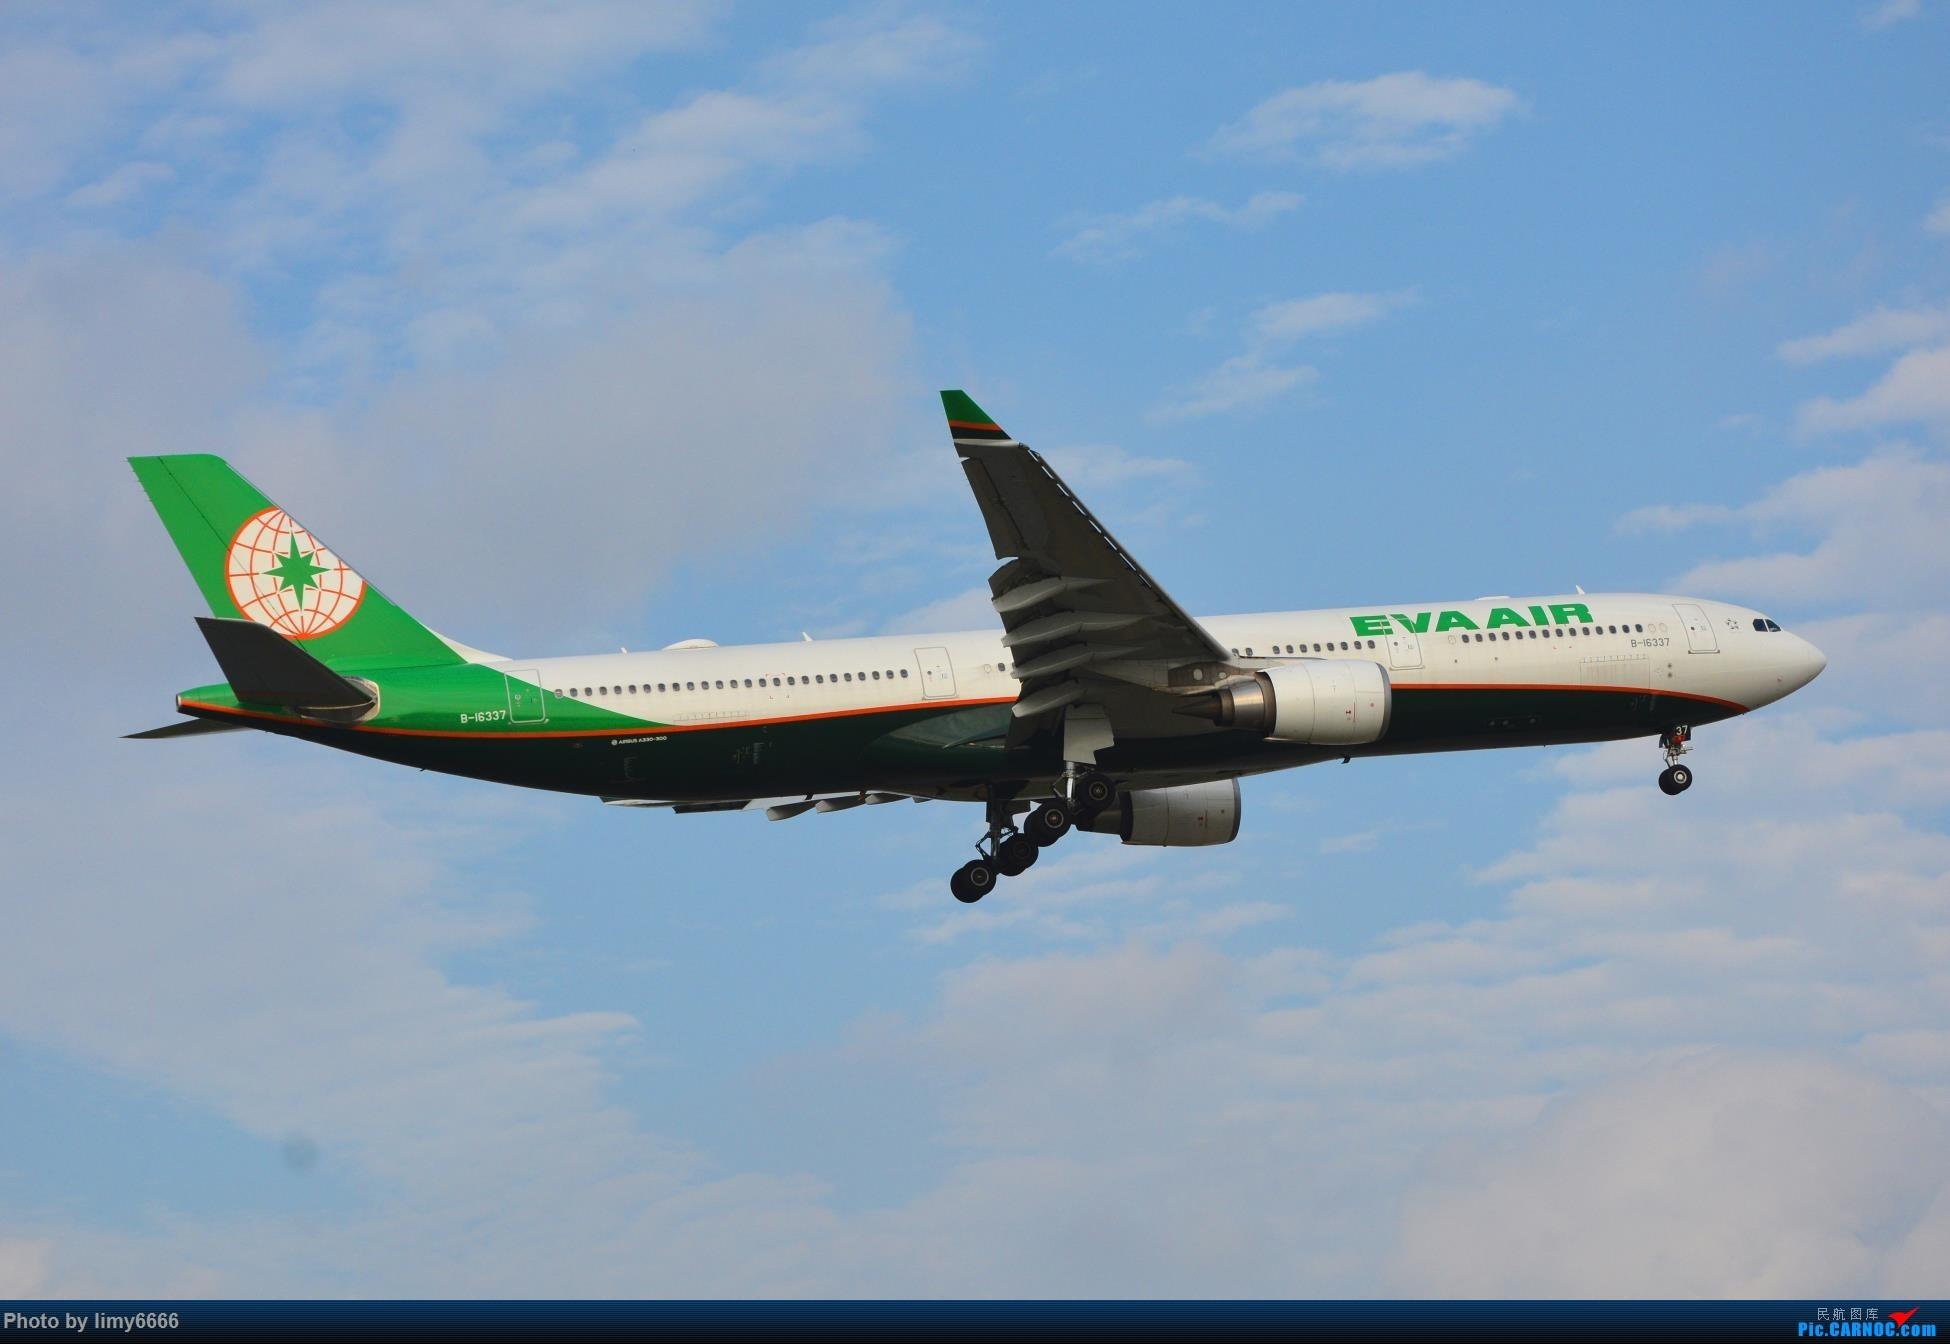 Re:[原创]上海虹桥机场拍机(在贵阳很少见或看不见的) AIRBUS A330-300 B-16337 中国上海虹桥国际机场